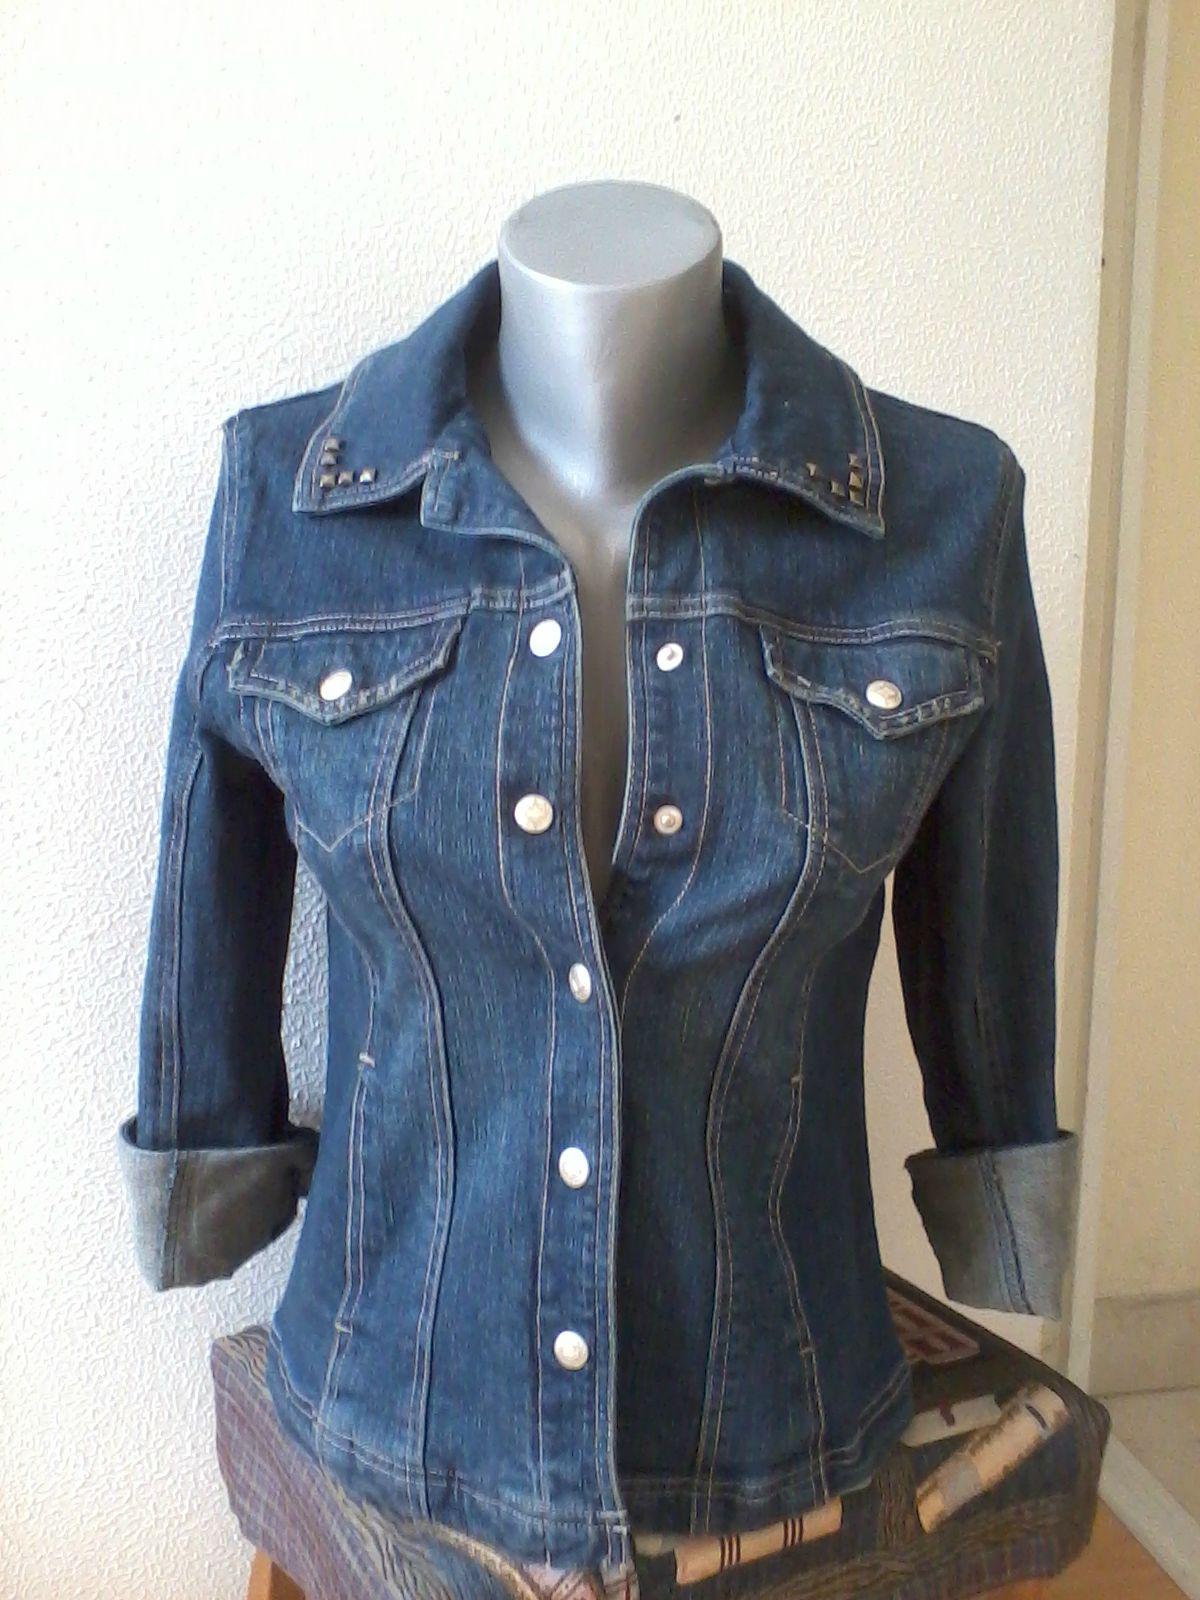 Neuf Veste Tshr1wq Jeans Zara En Le Dressing Cloutée Vide 6gYfwqIIx